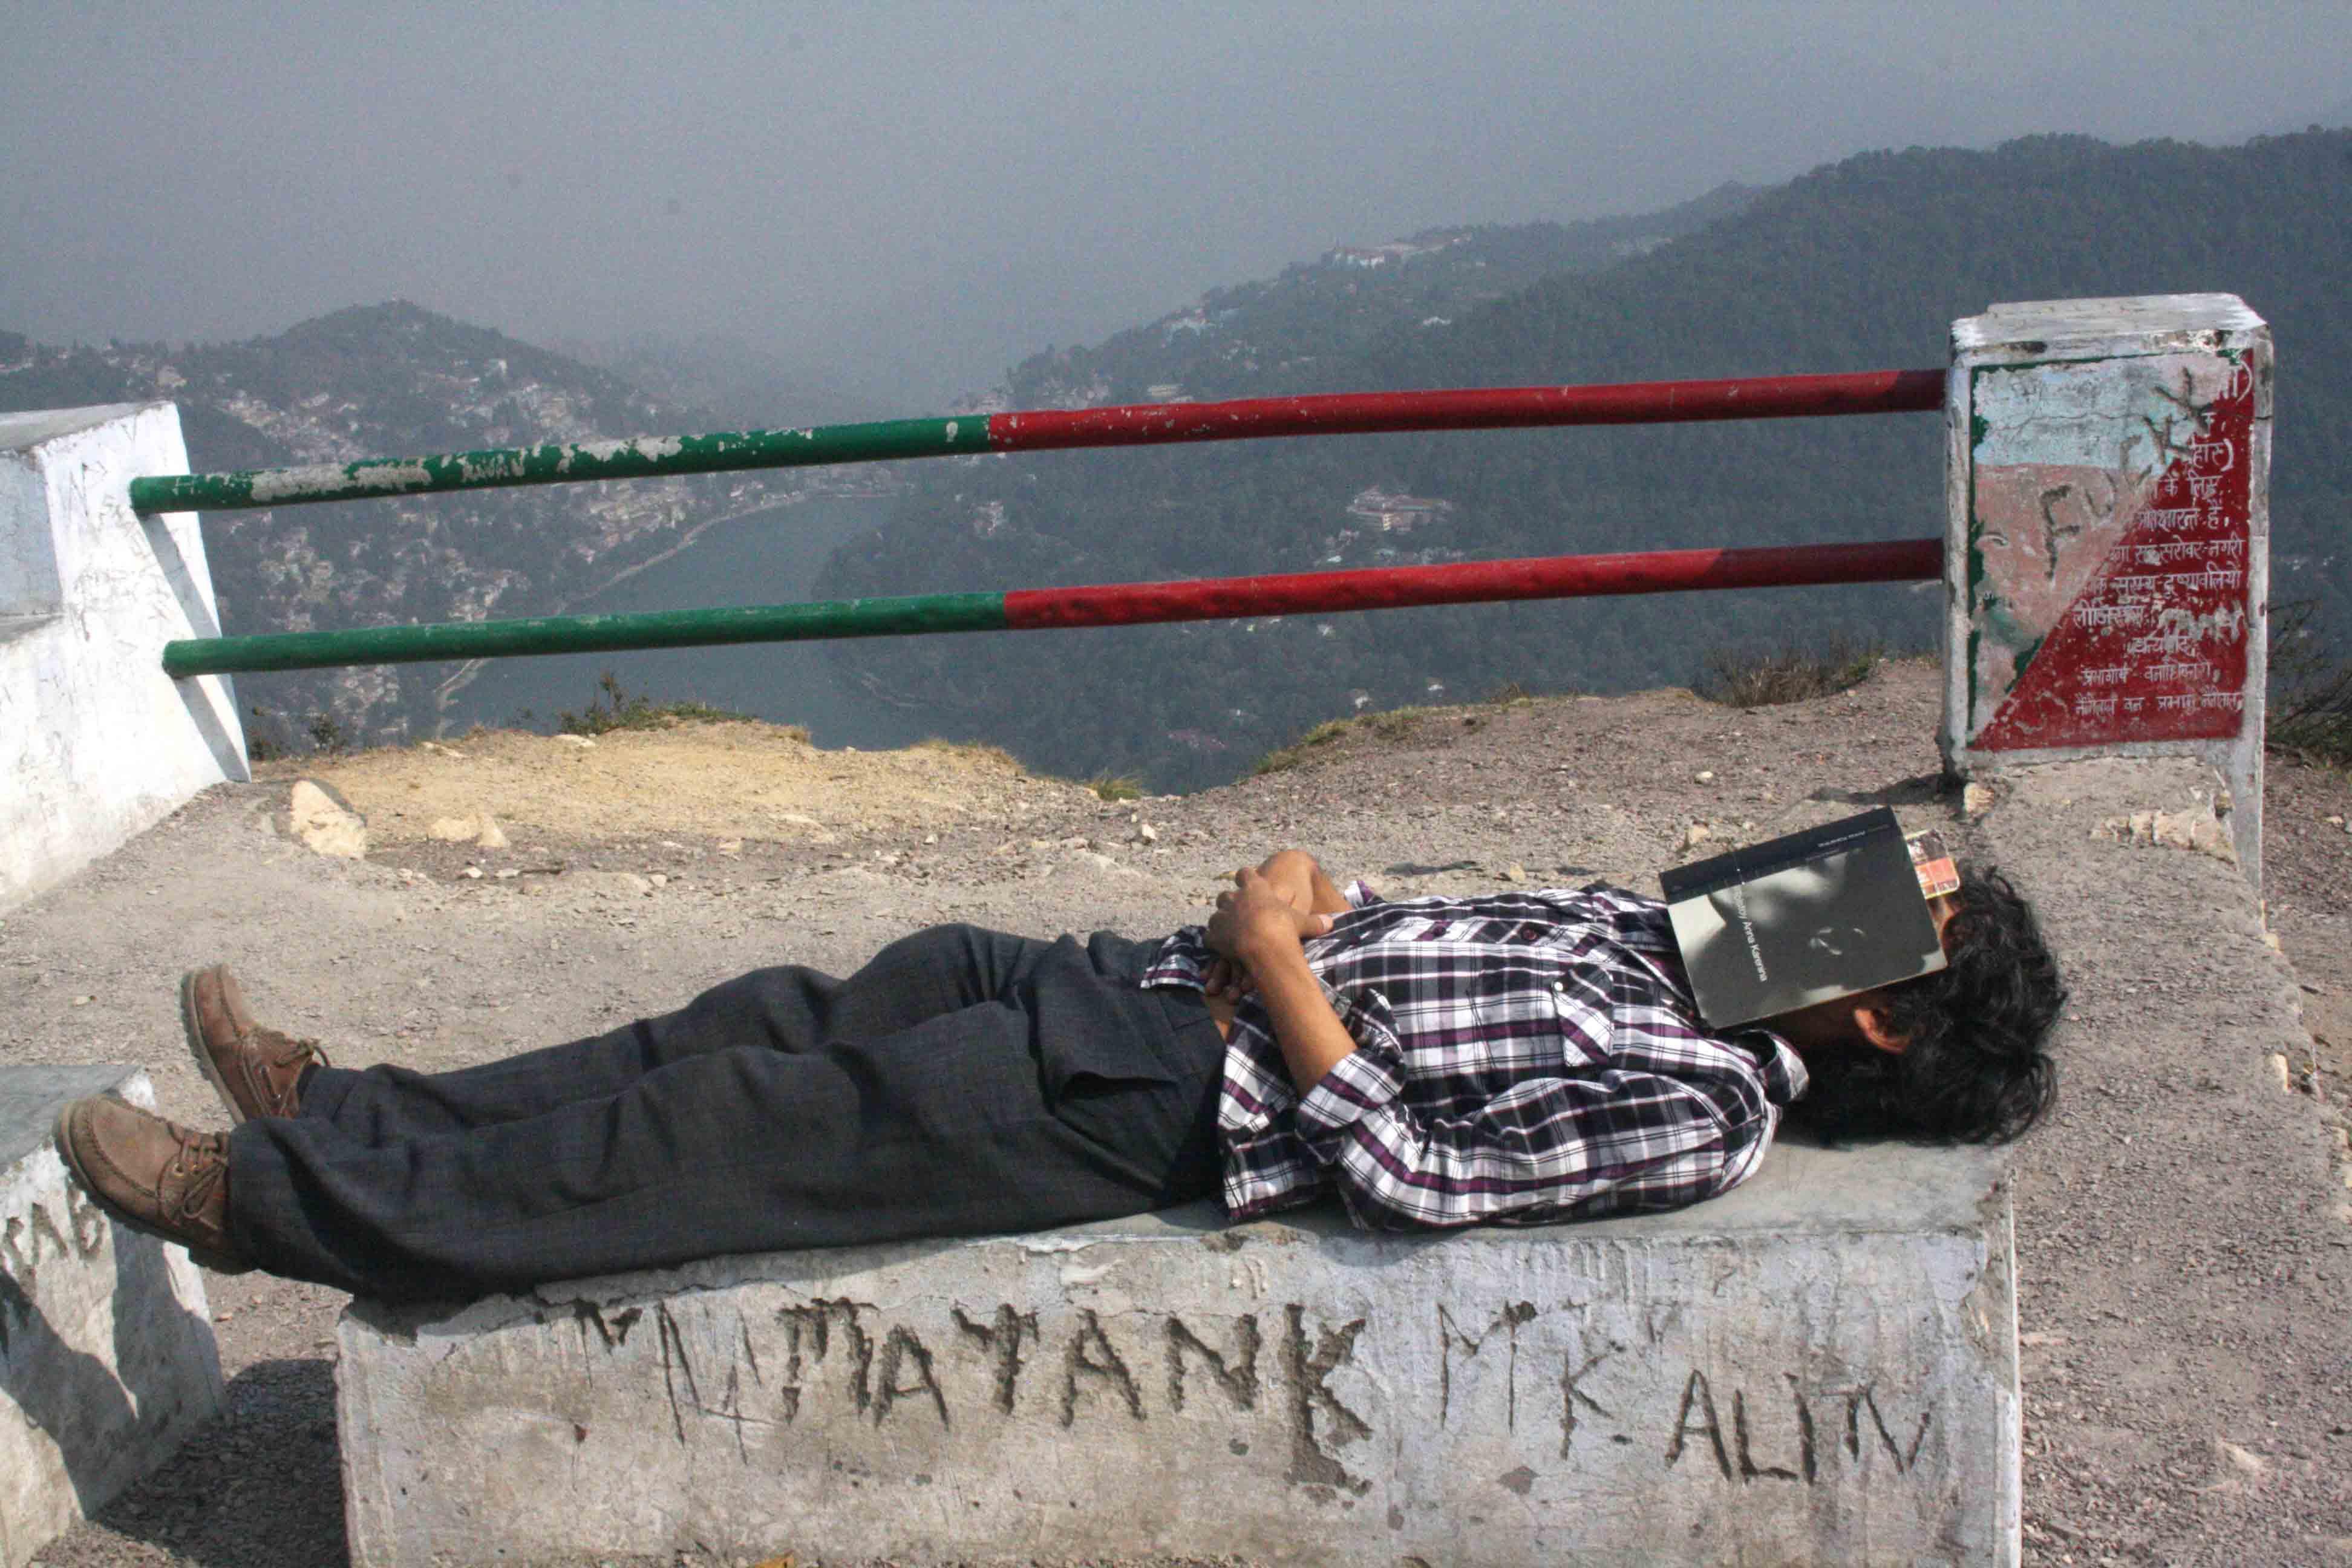 City Travel - Nainital, North of Delhi